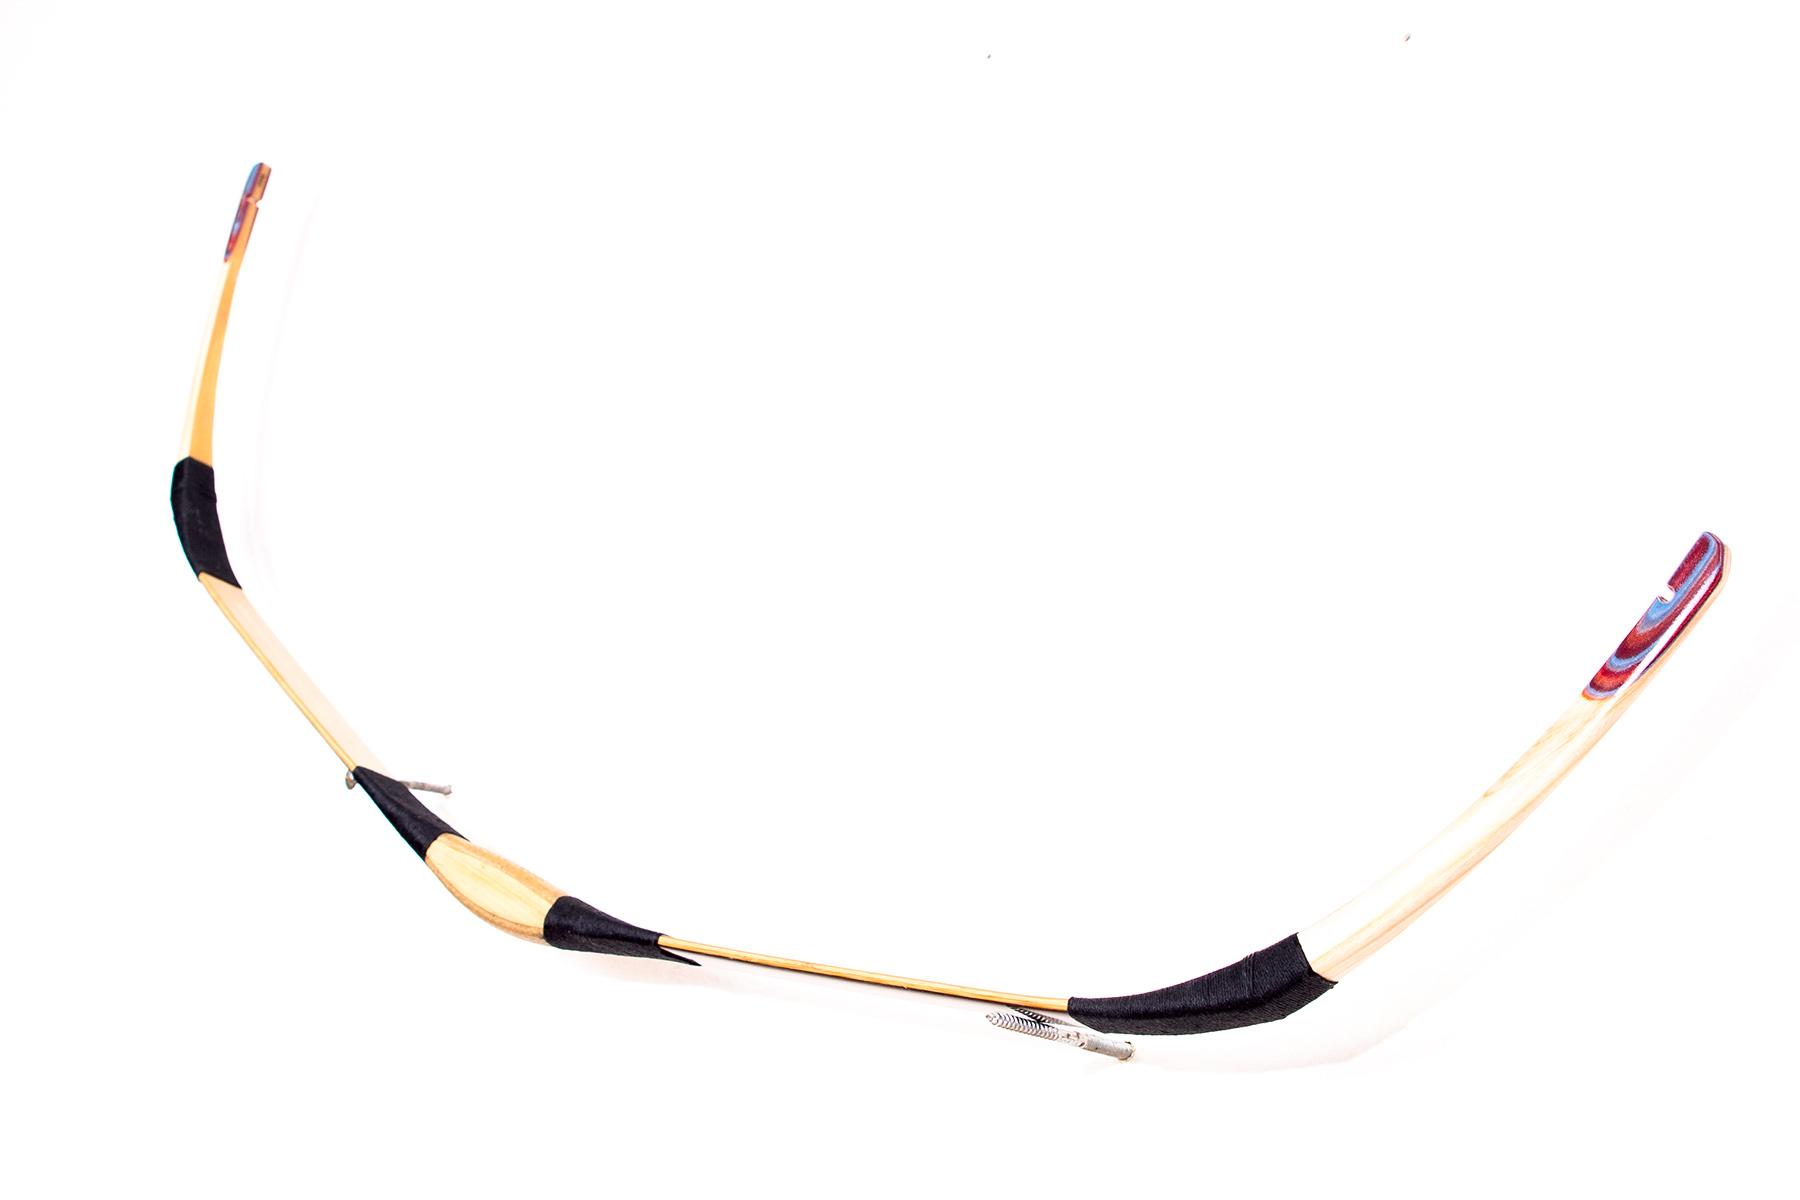 Grozer Hungaian Laminated recurve bow